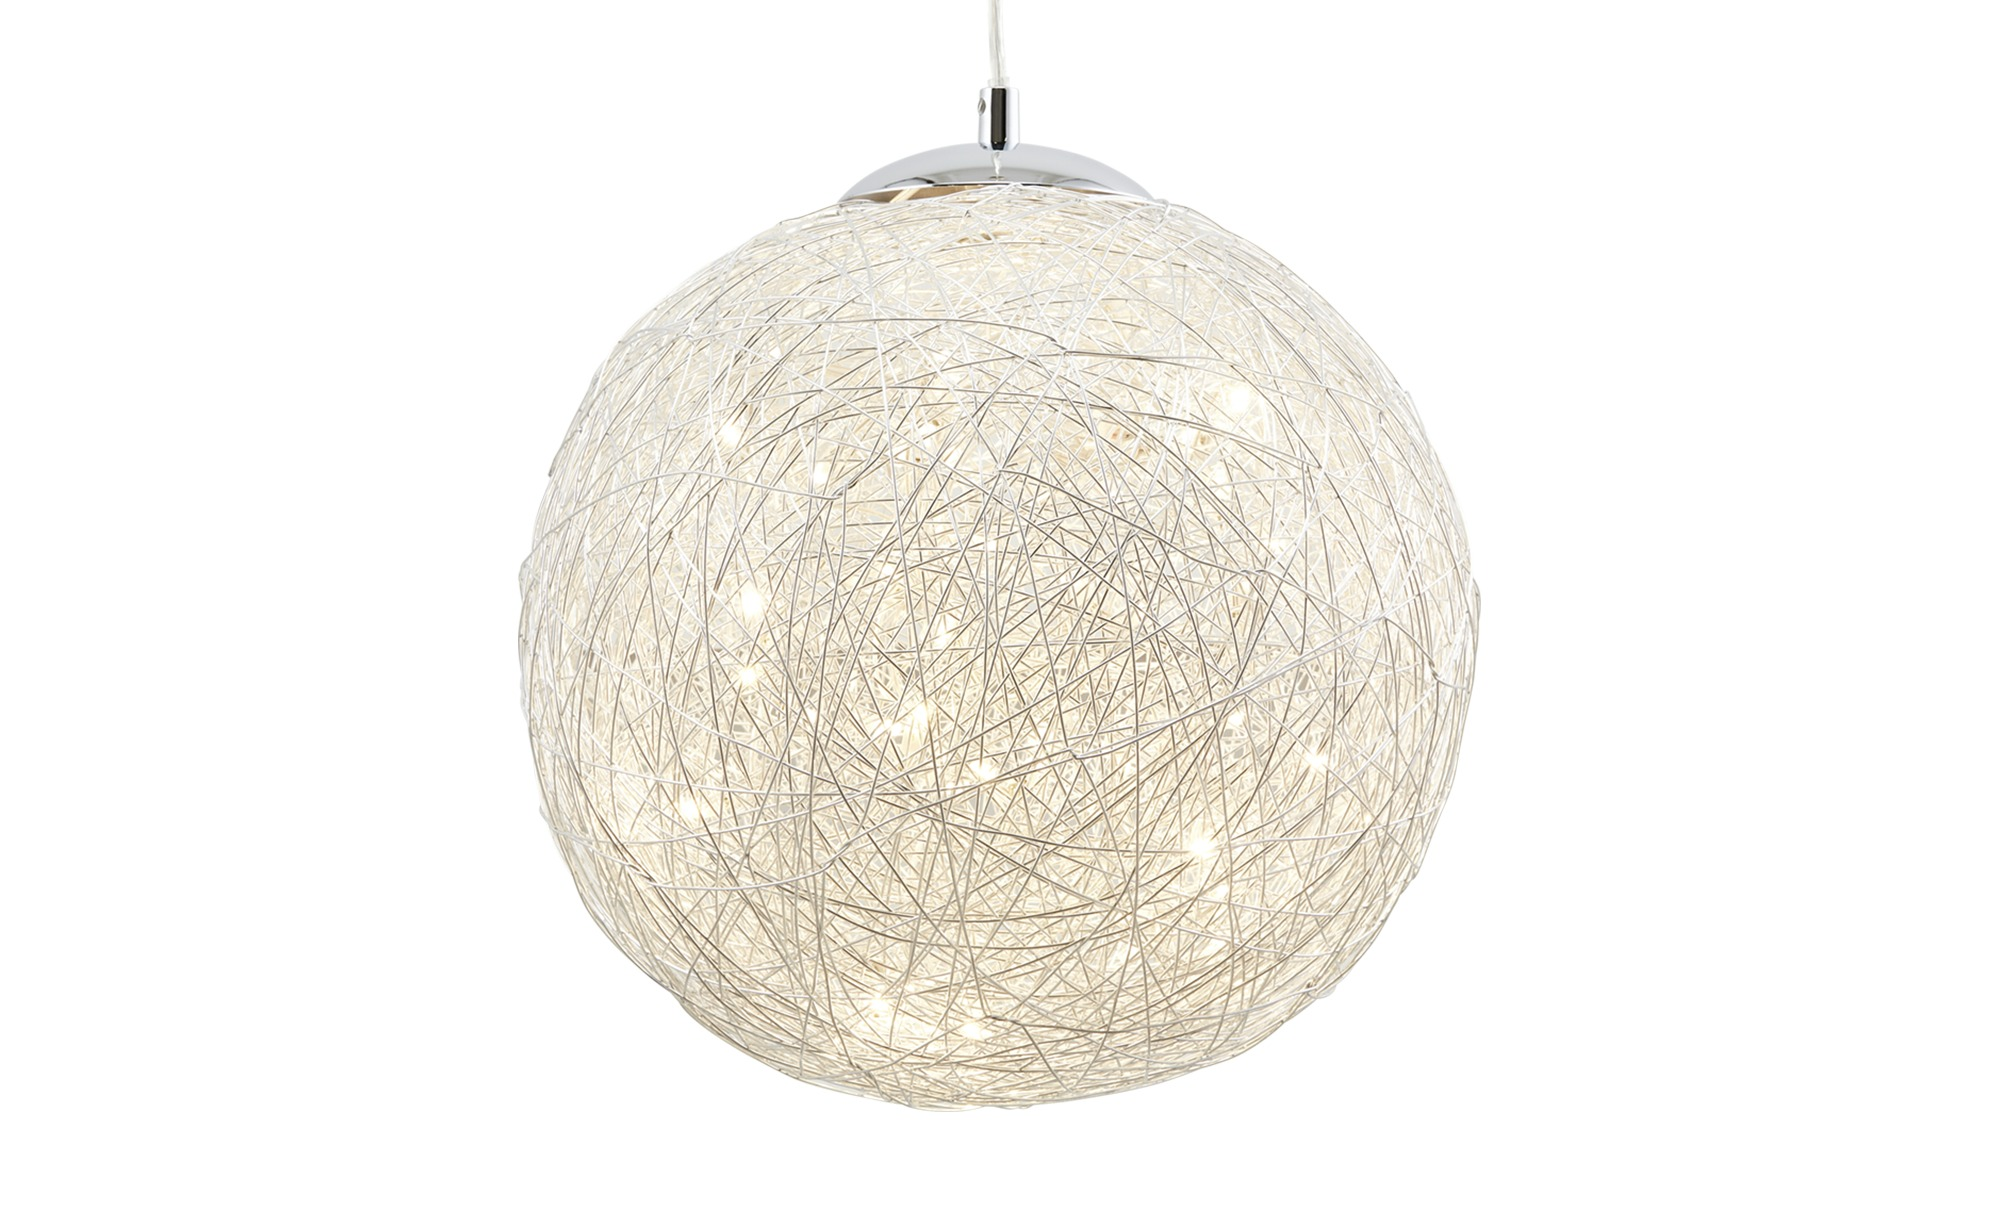 Trio LED-Pendelleuchte, 1-flammig, Drahtgeflecht ¦ silberØ: [30.0] Lampen & Leuchten > LED-Leuchten > LED-Pendelleuchten - Höffner